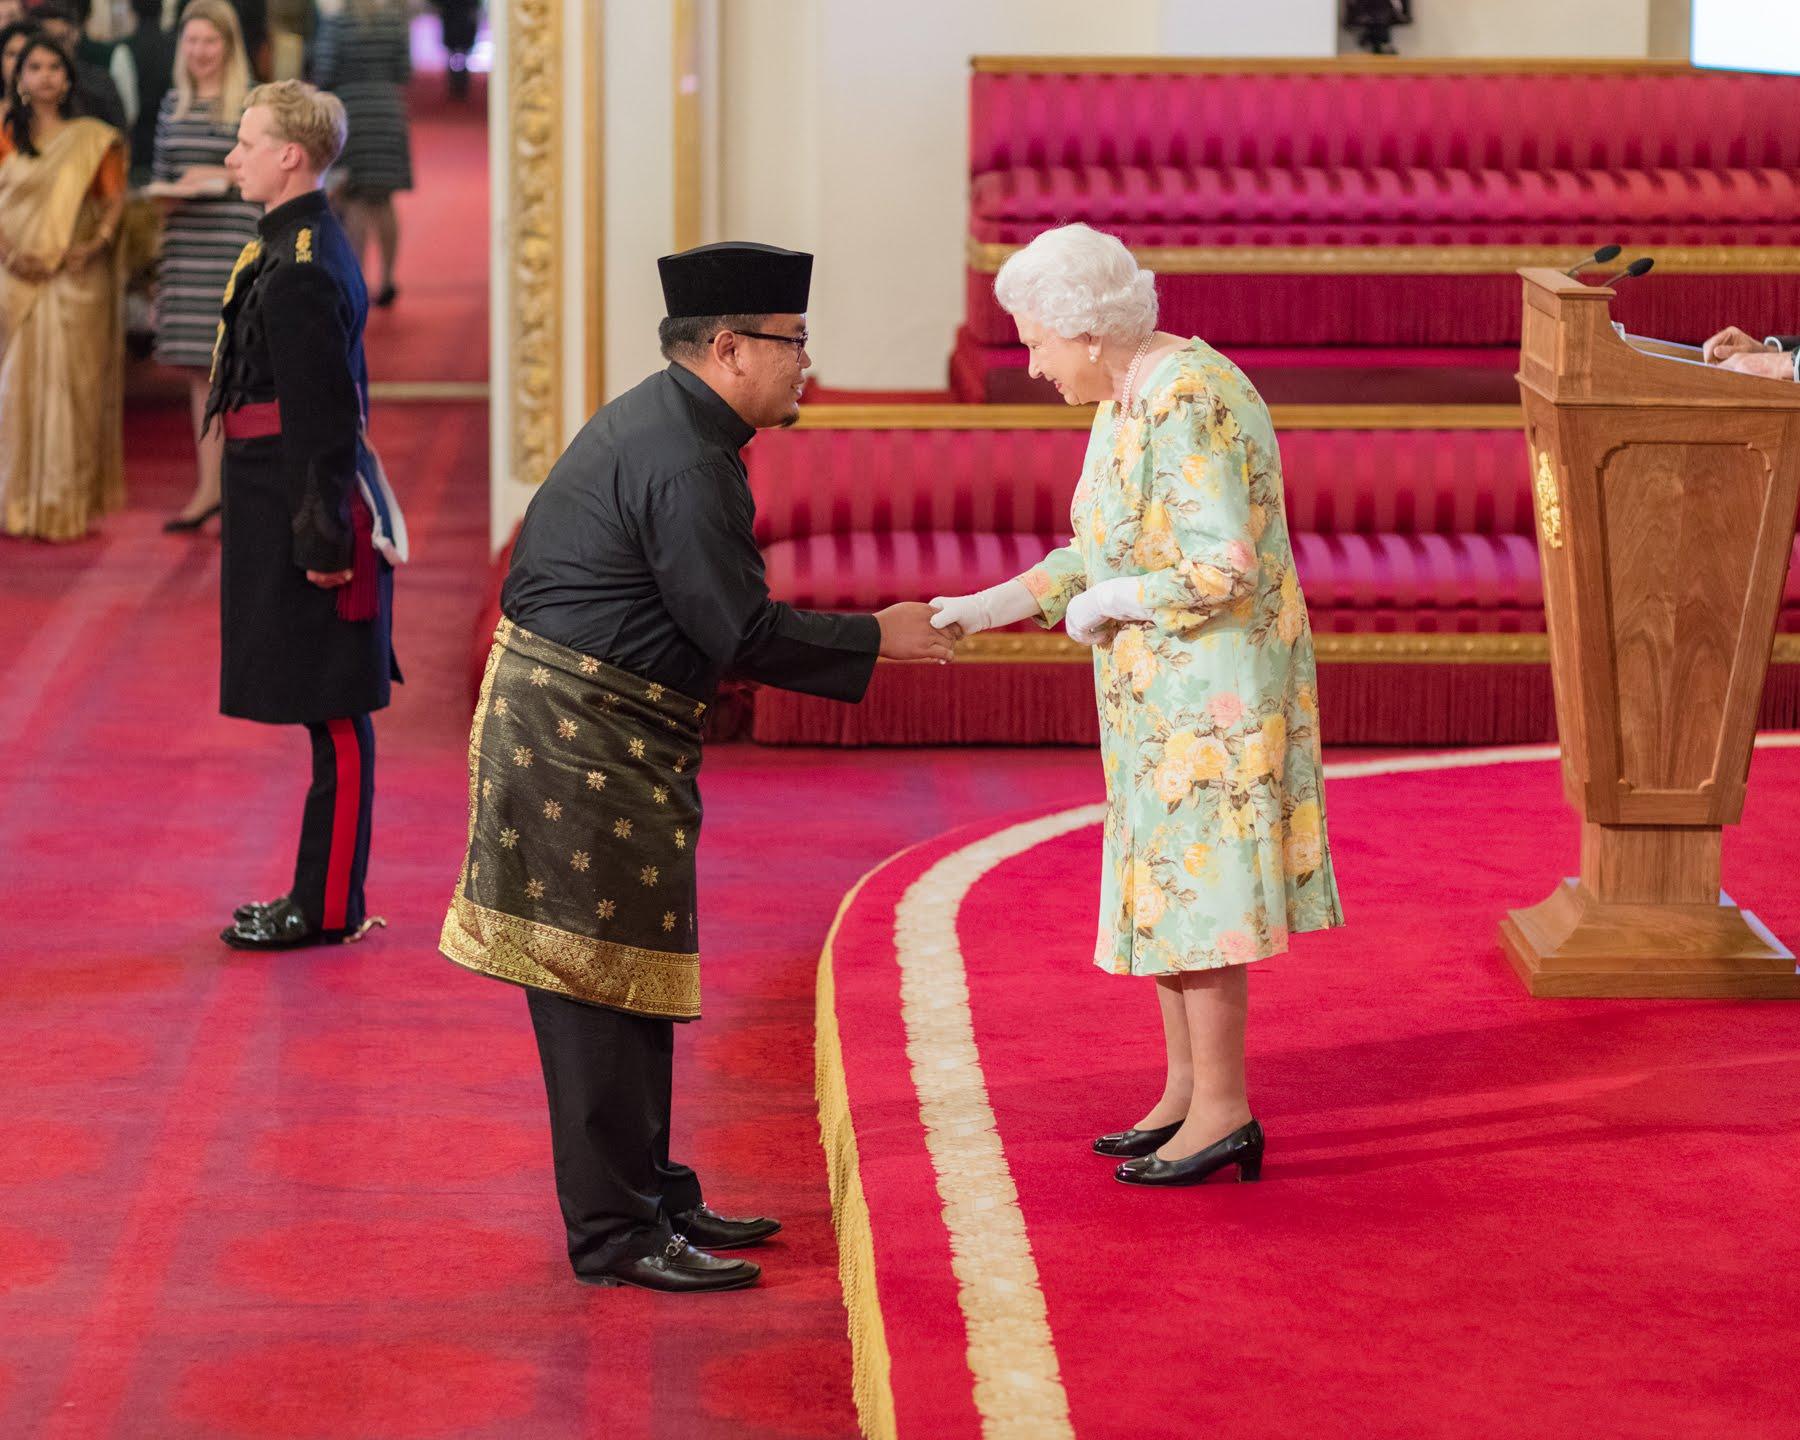 Ahmad Faddillah Sellahuddin with The Queen